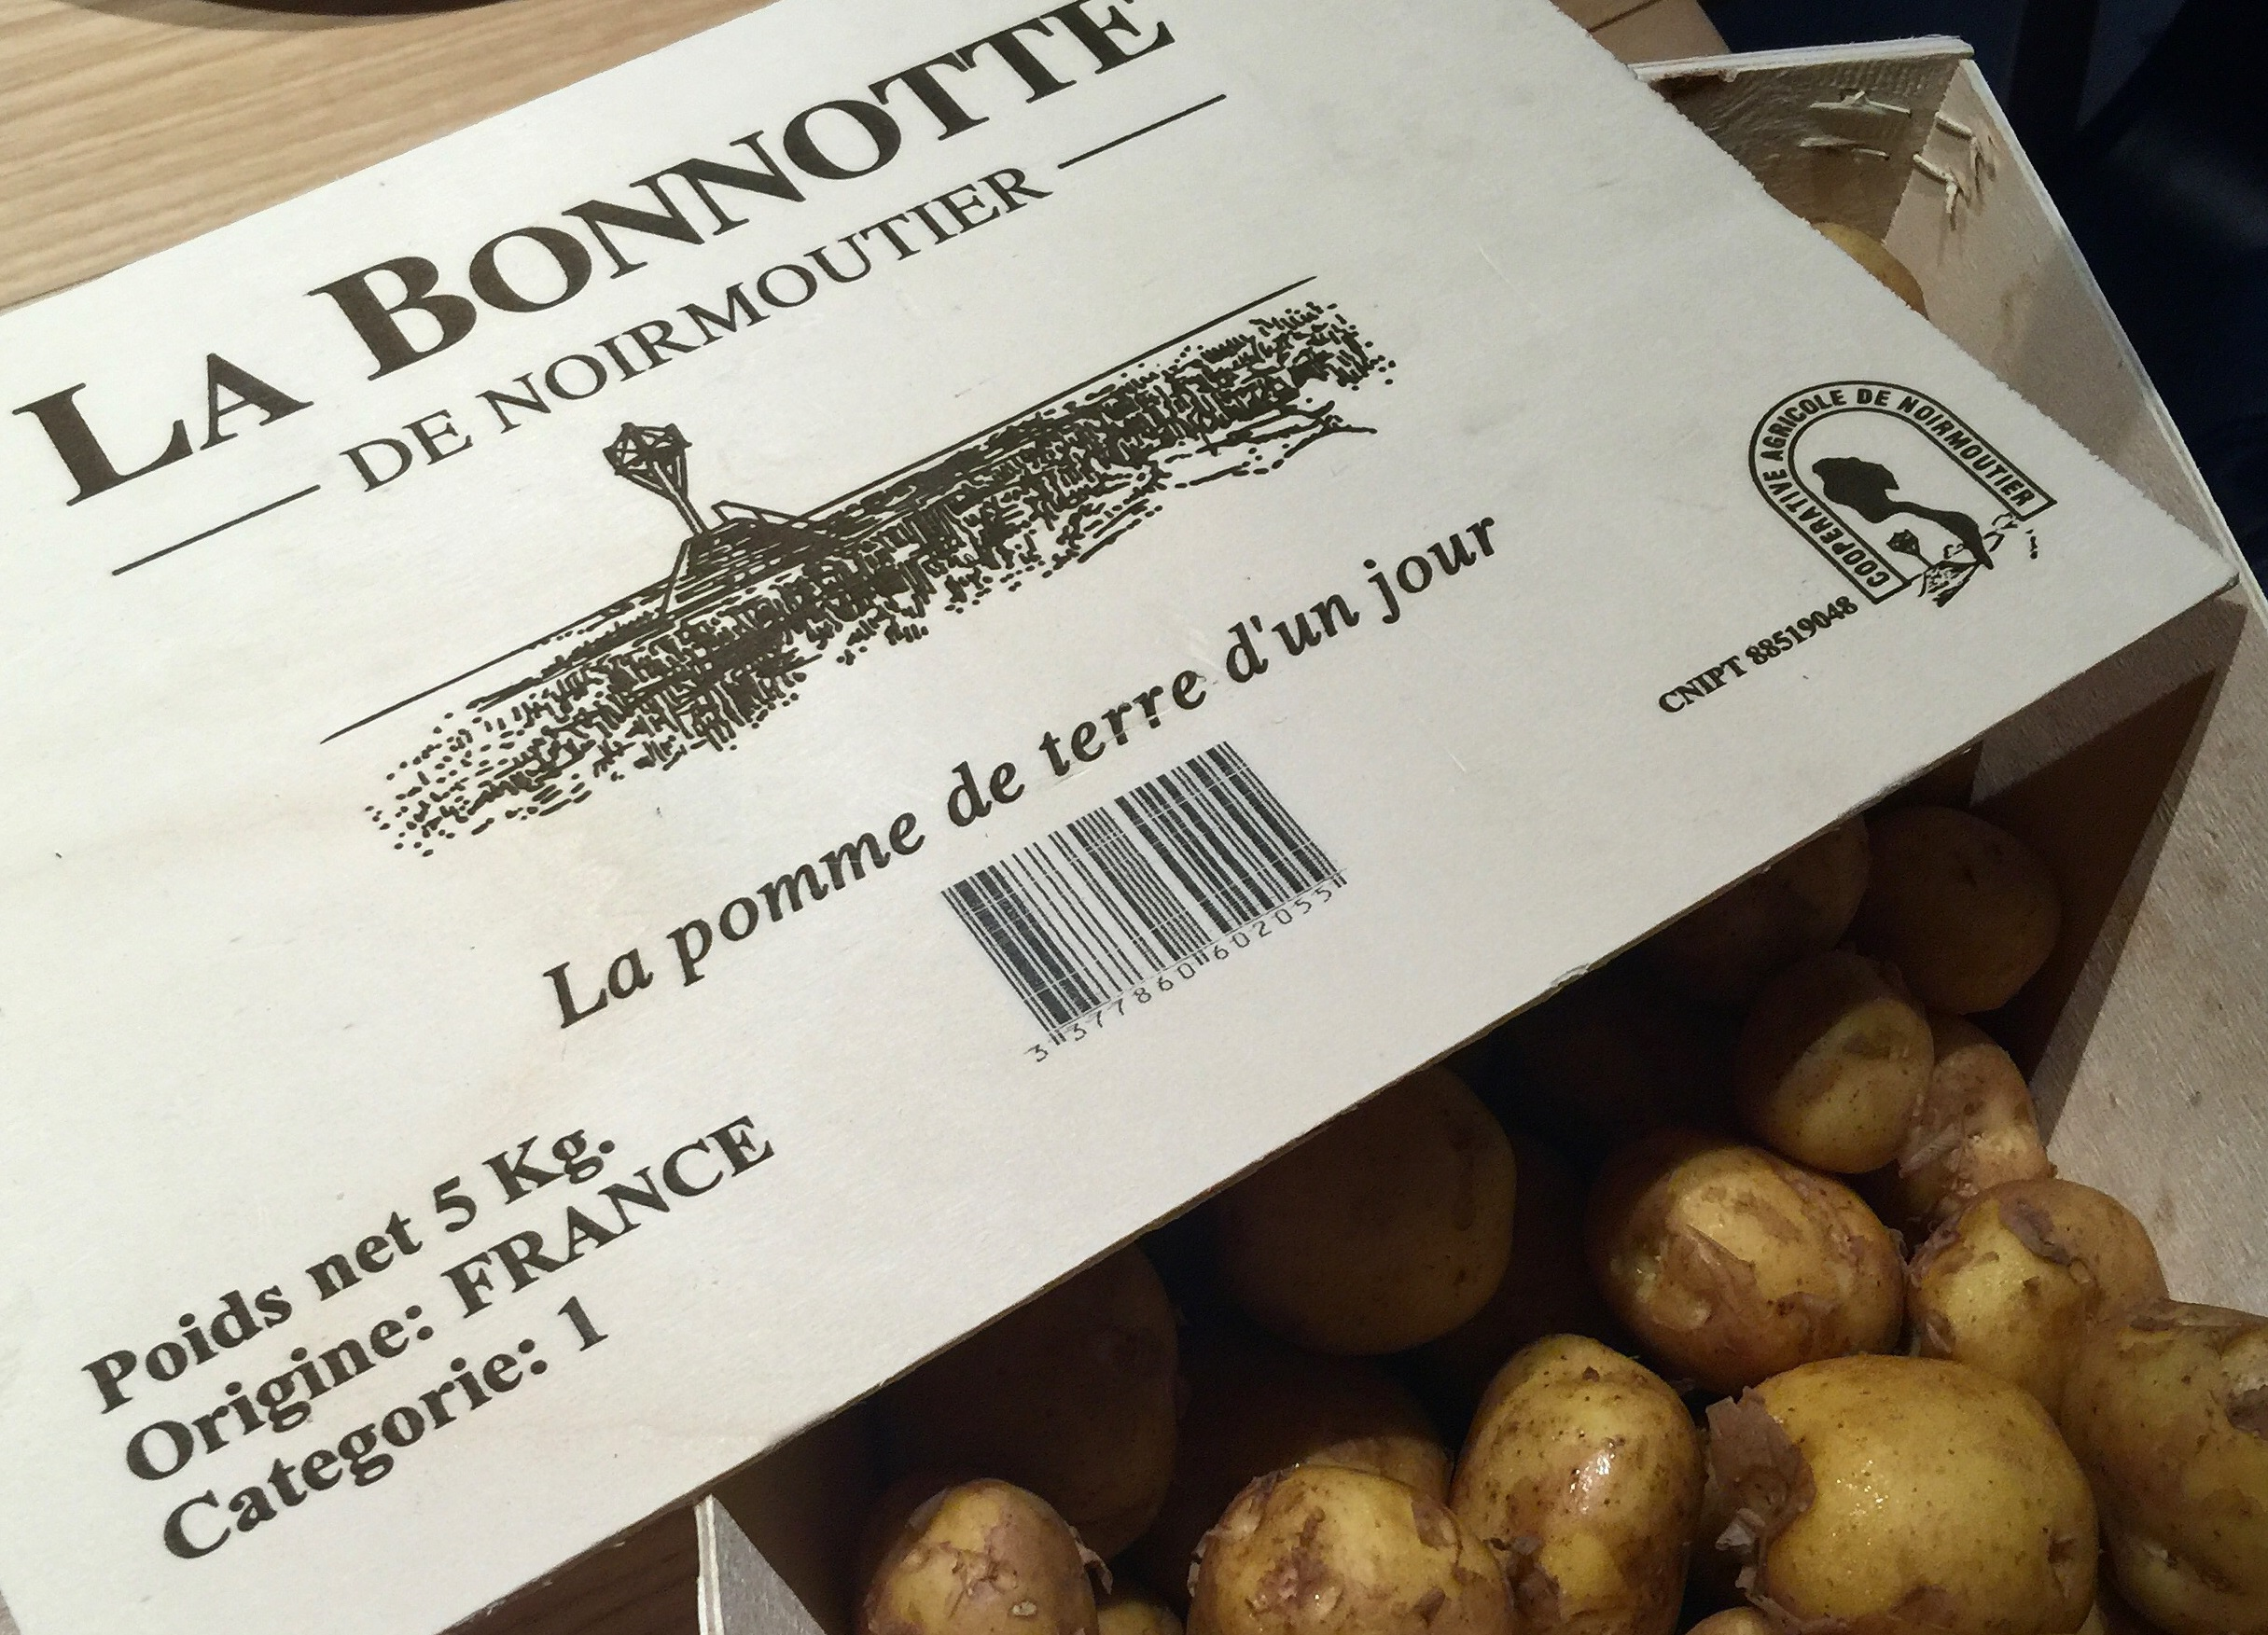 Patate bonnotte